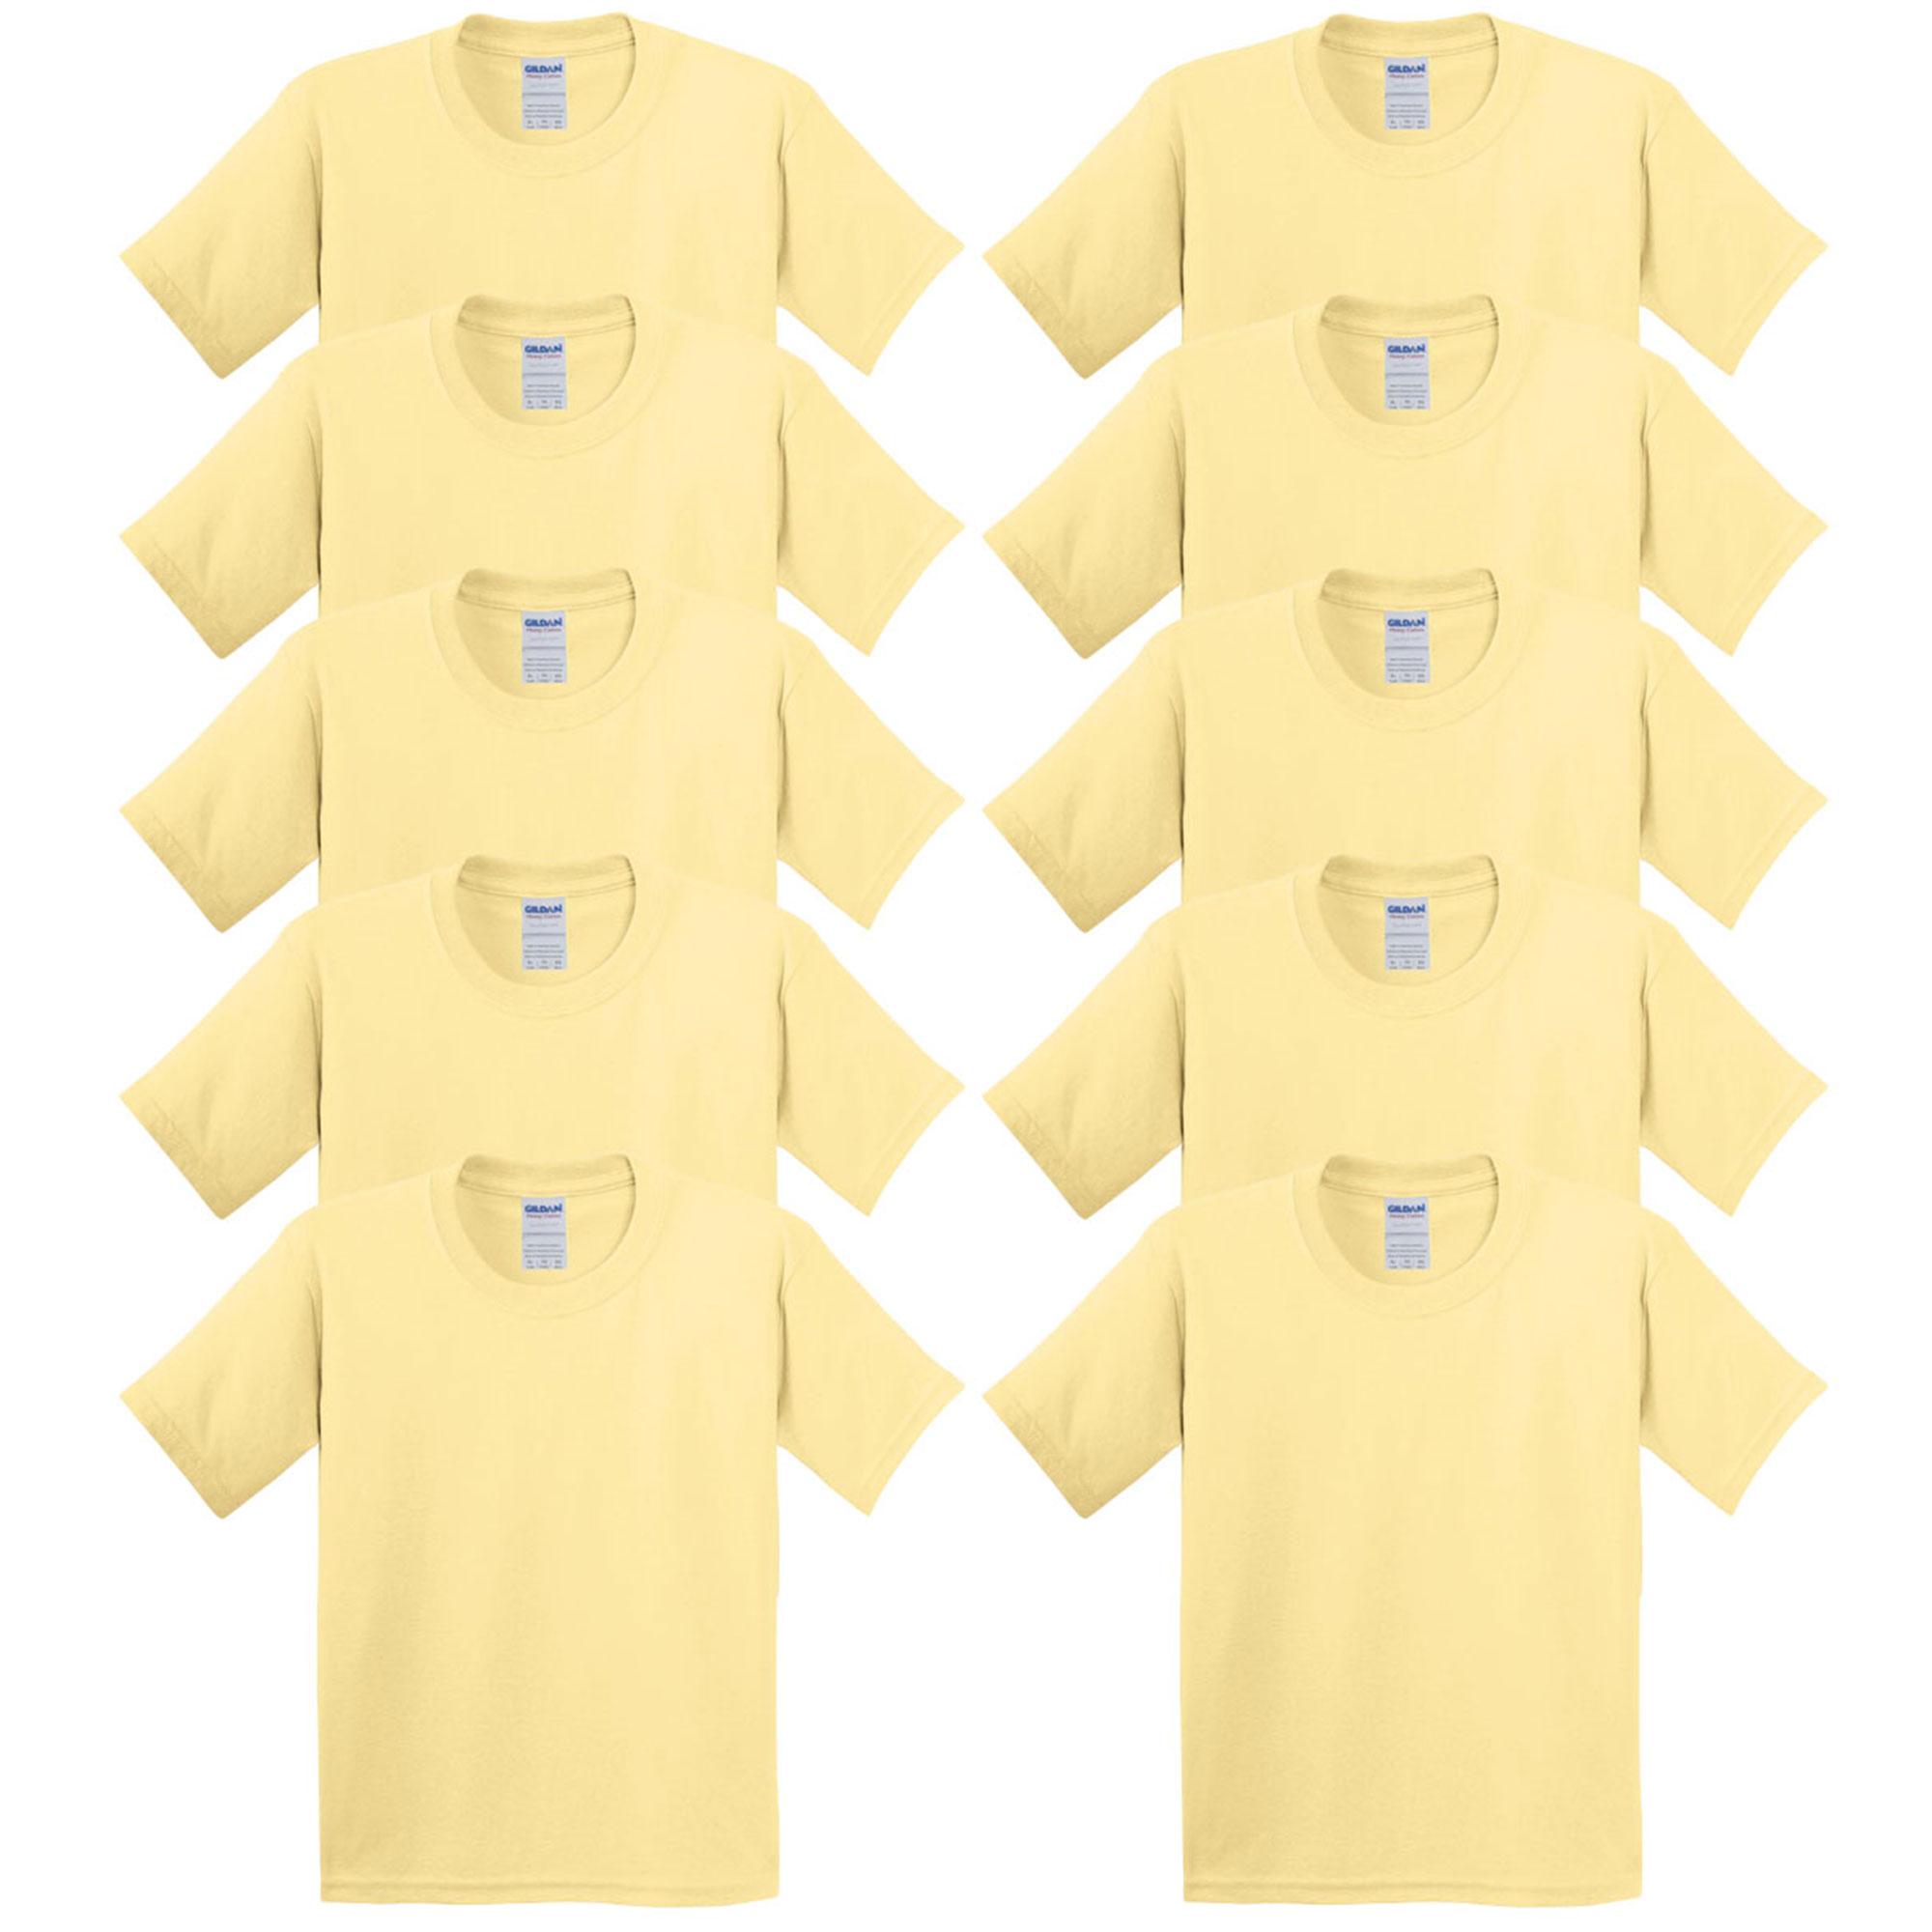 d1a8c278 Gildan White T Shirt Walmart – DACC